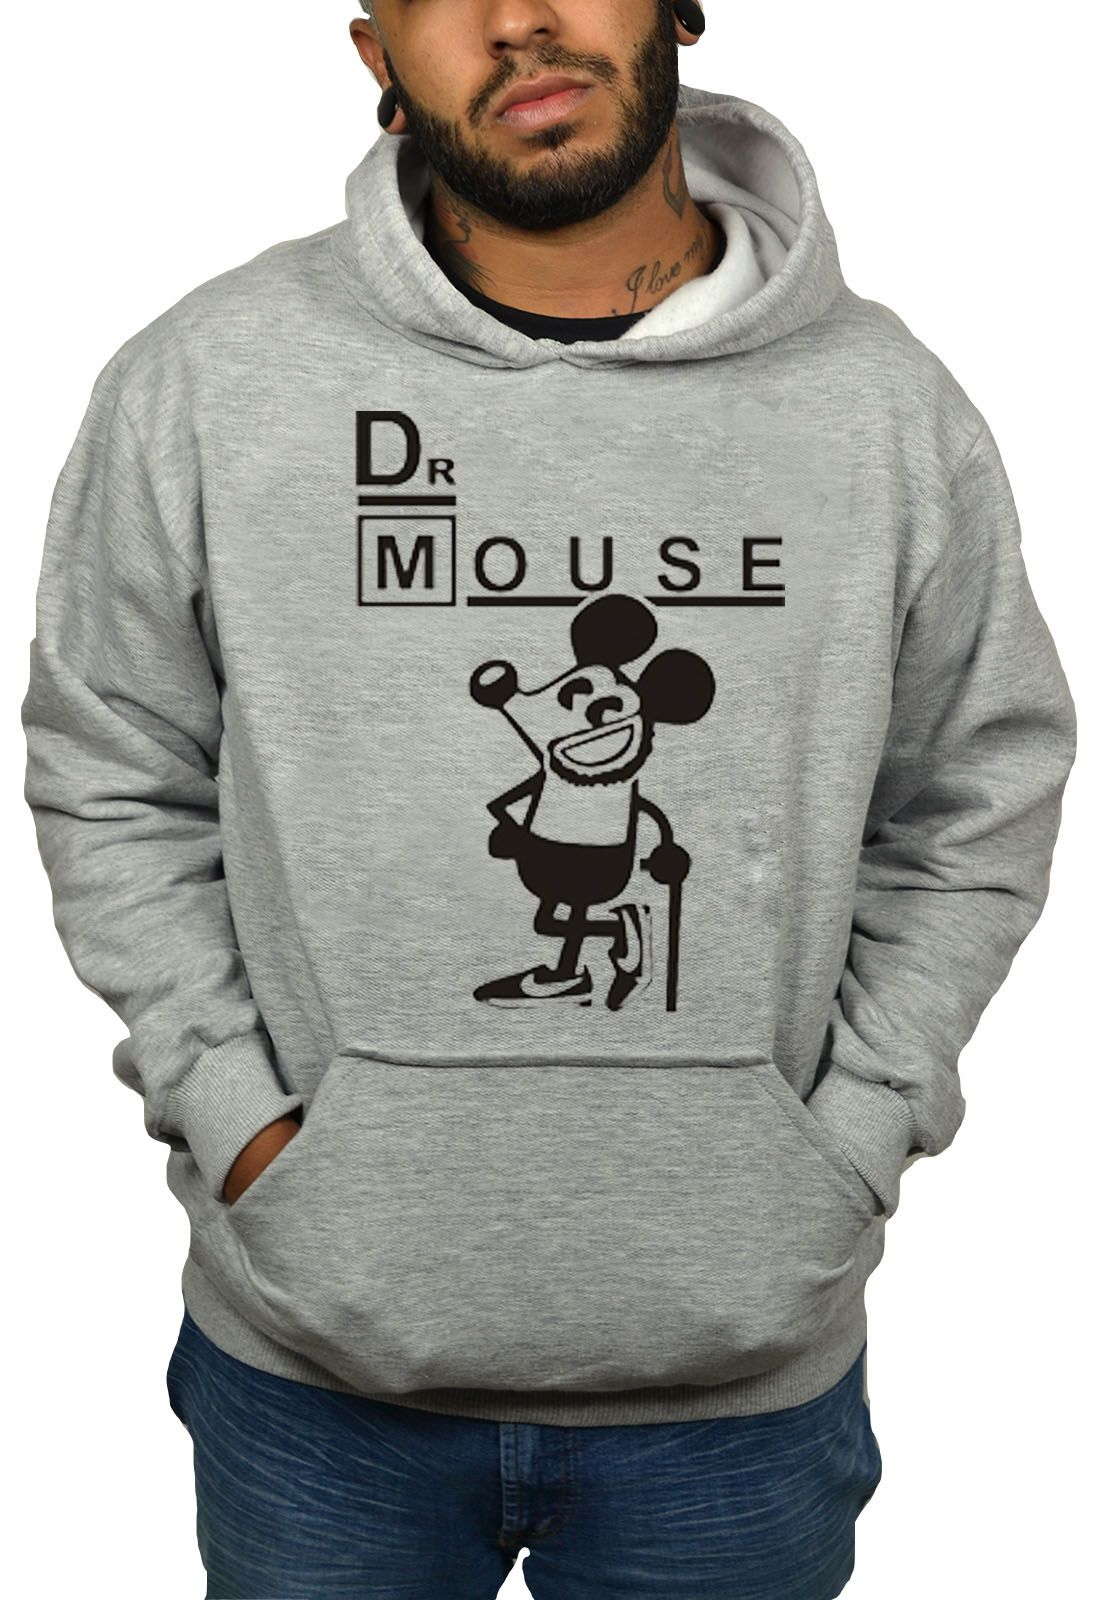 Moletom HShop Dr Mouse Cinza Mescla  - HShop